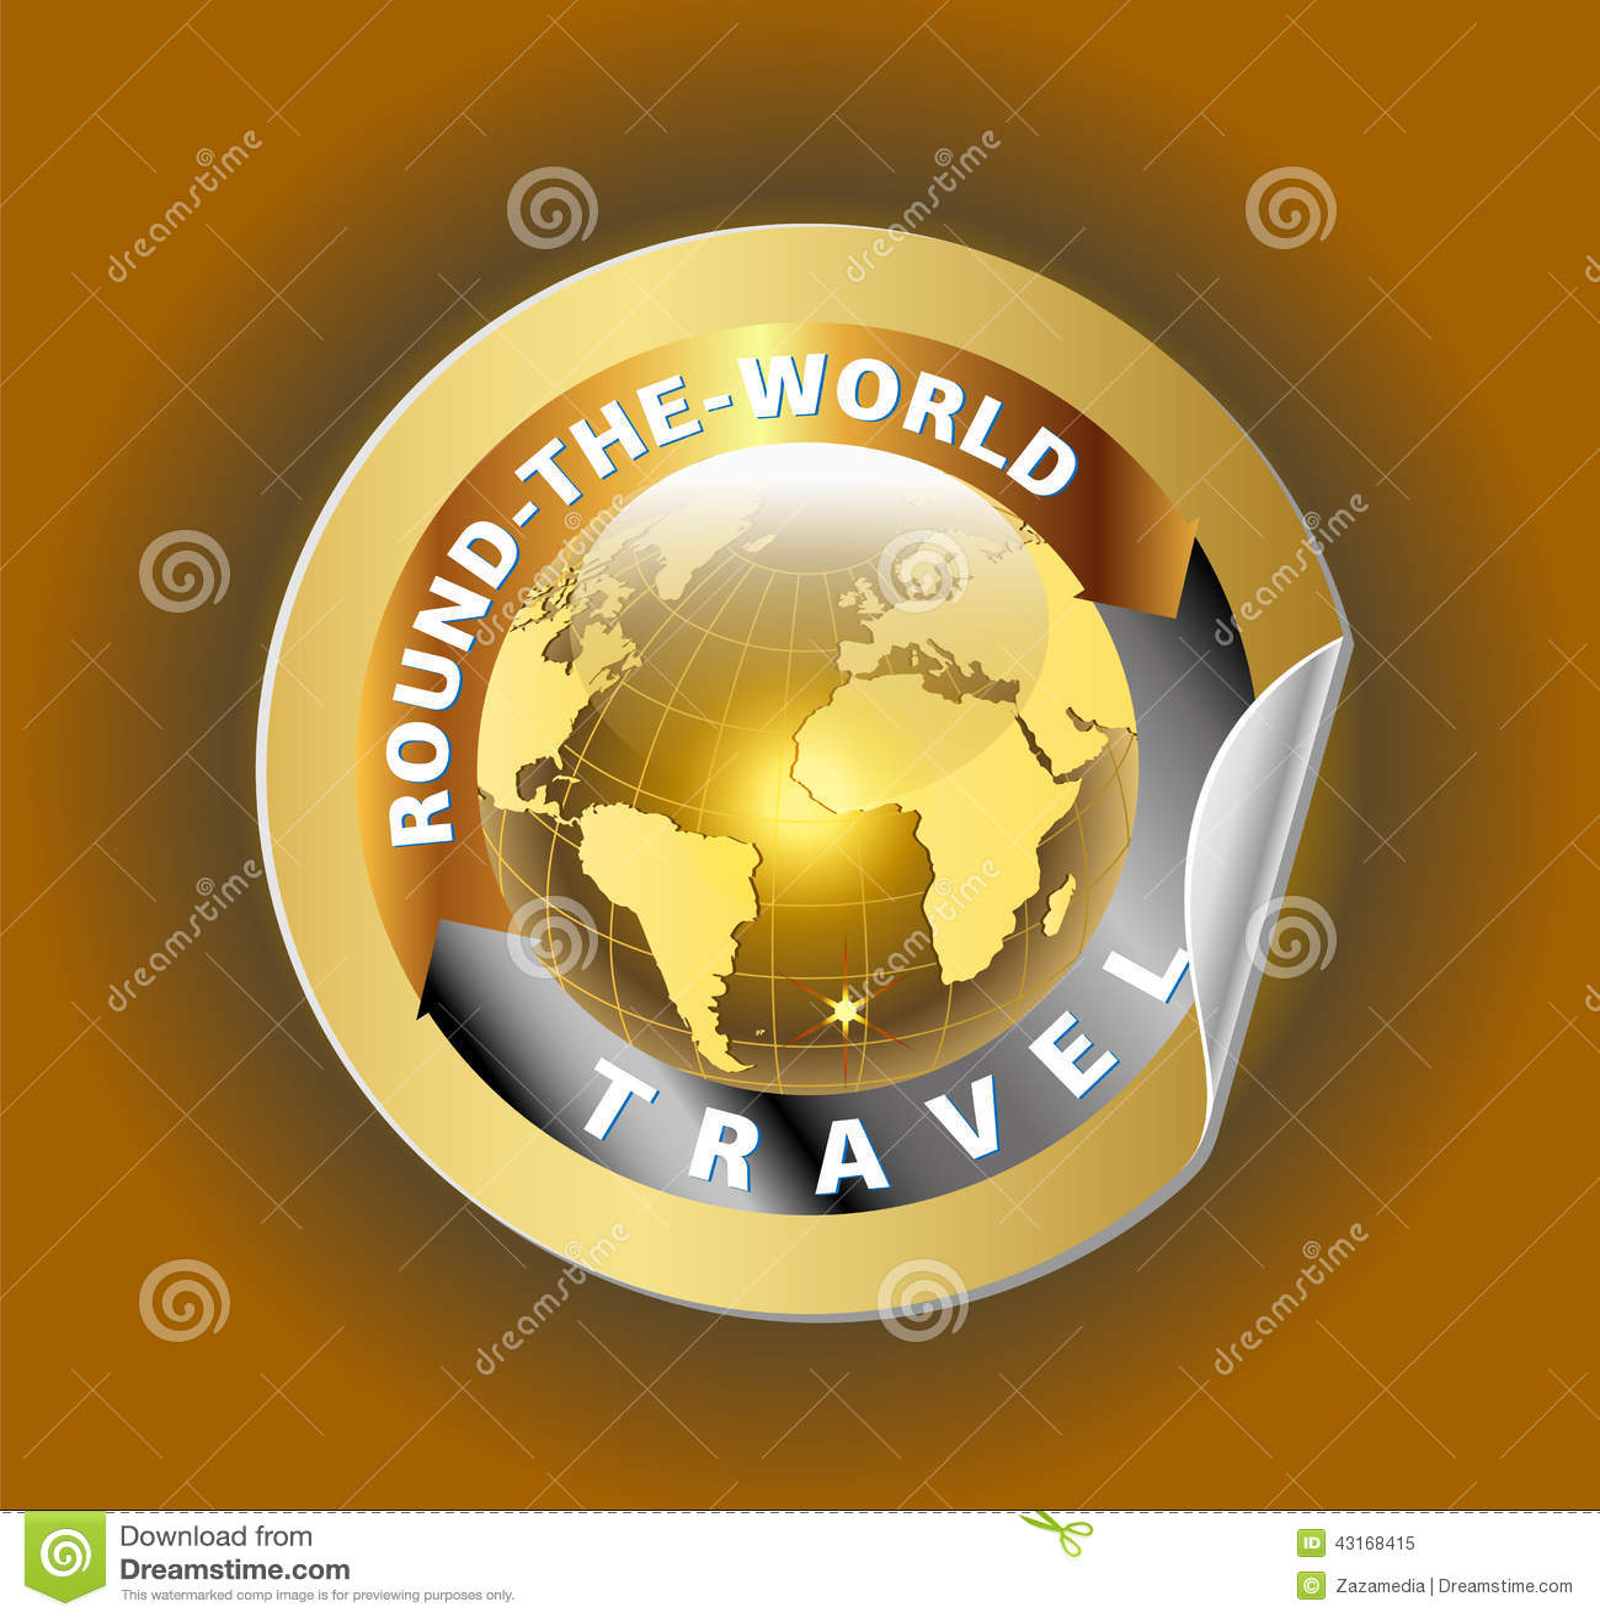 travel round the world symbol with golden globe symbol label cartoon vector. Black Bedroom Furniture Sets. Home Design Ideas